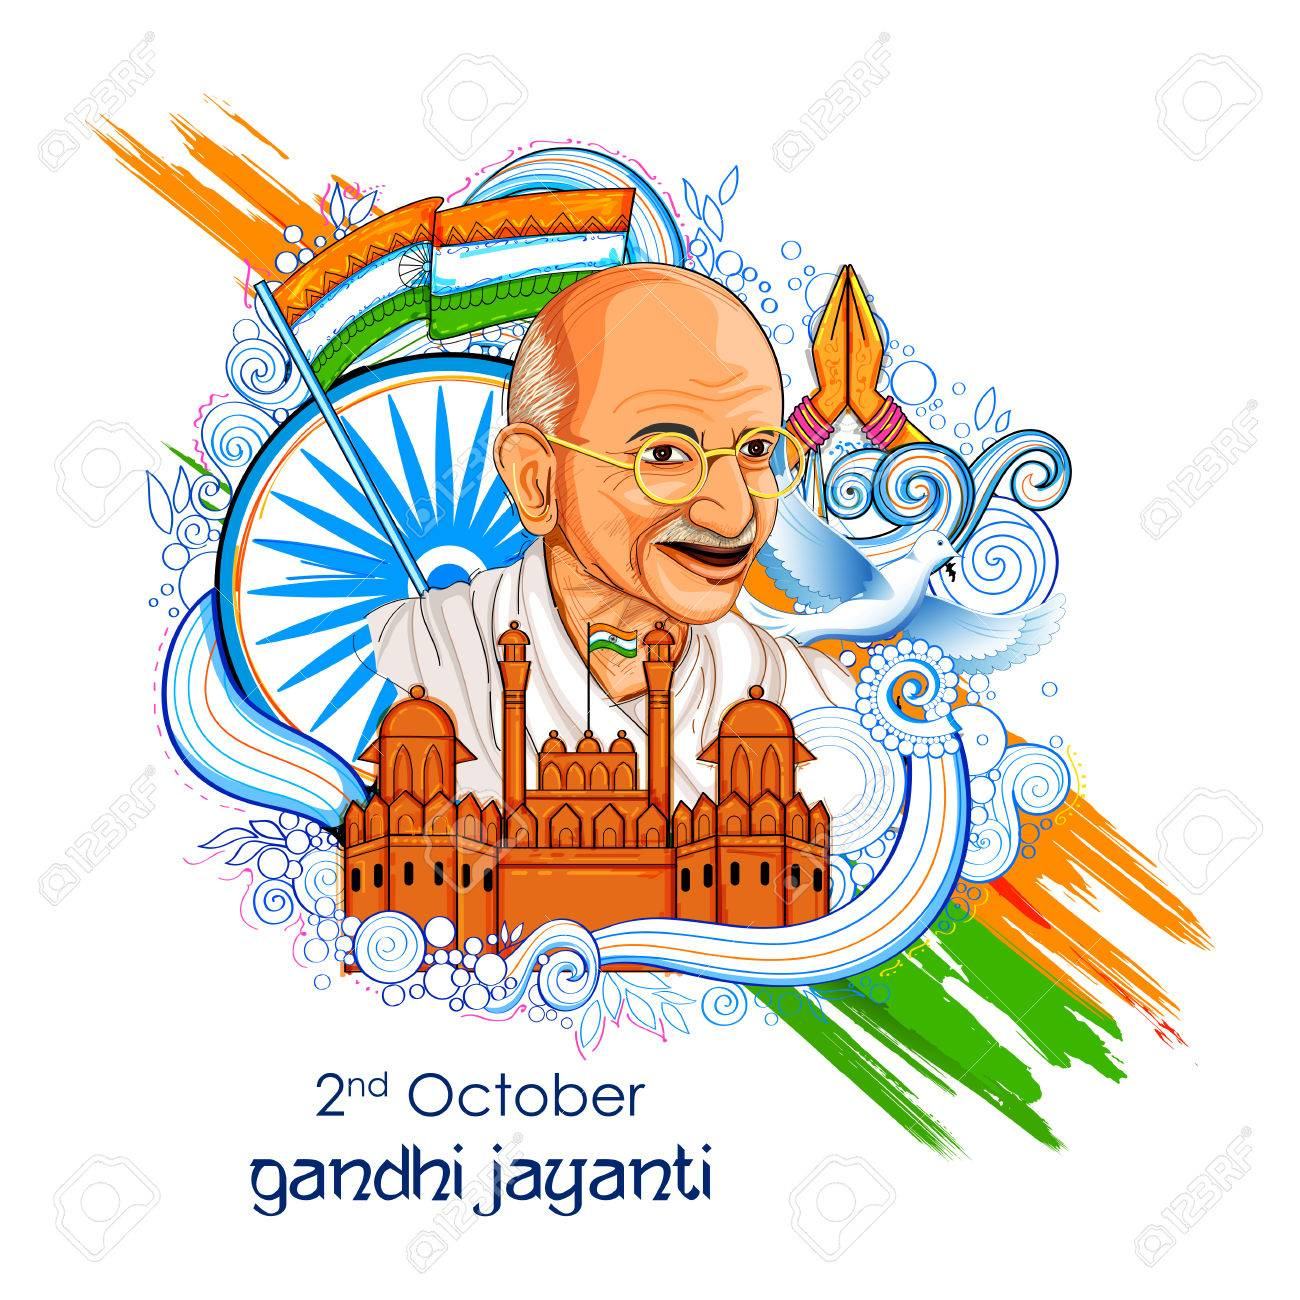 illustration of India background for 2nd October Gandhi Jayanti